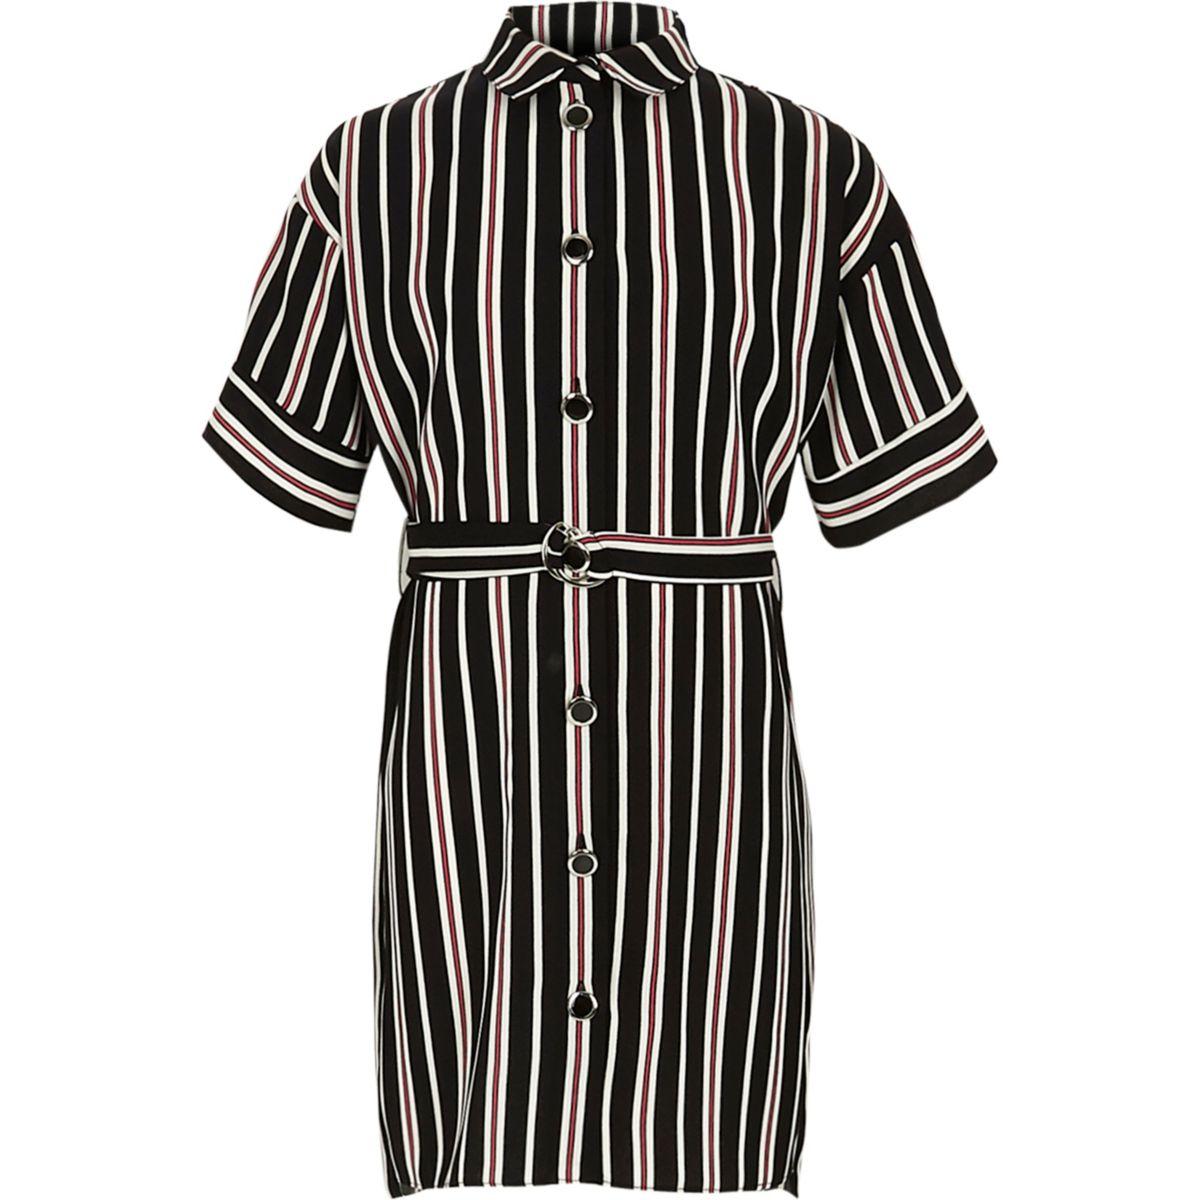 Robe chemise noire style militaire à rayures pour fille